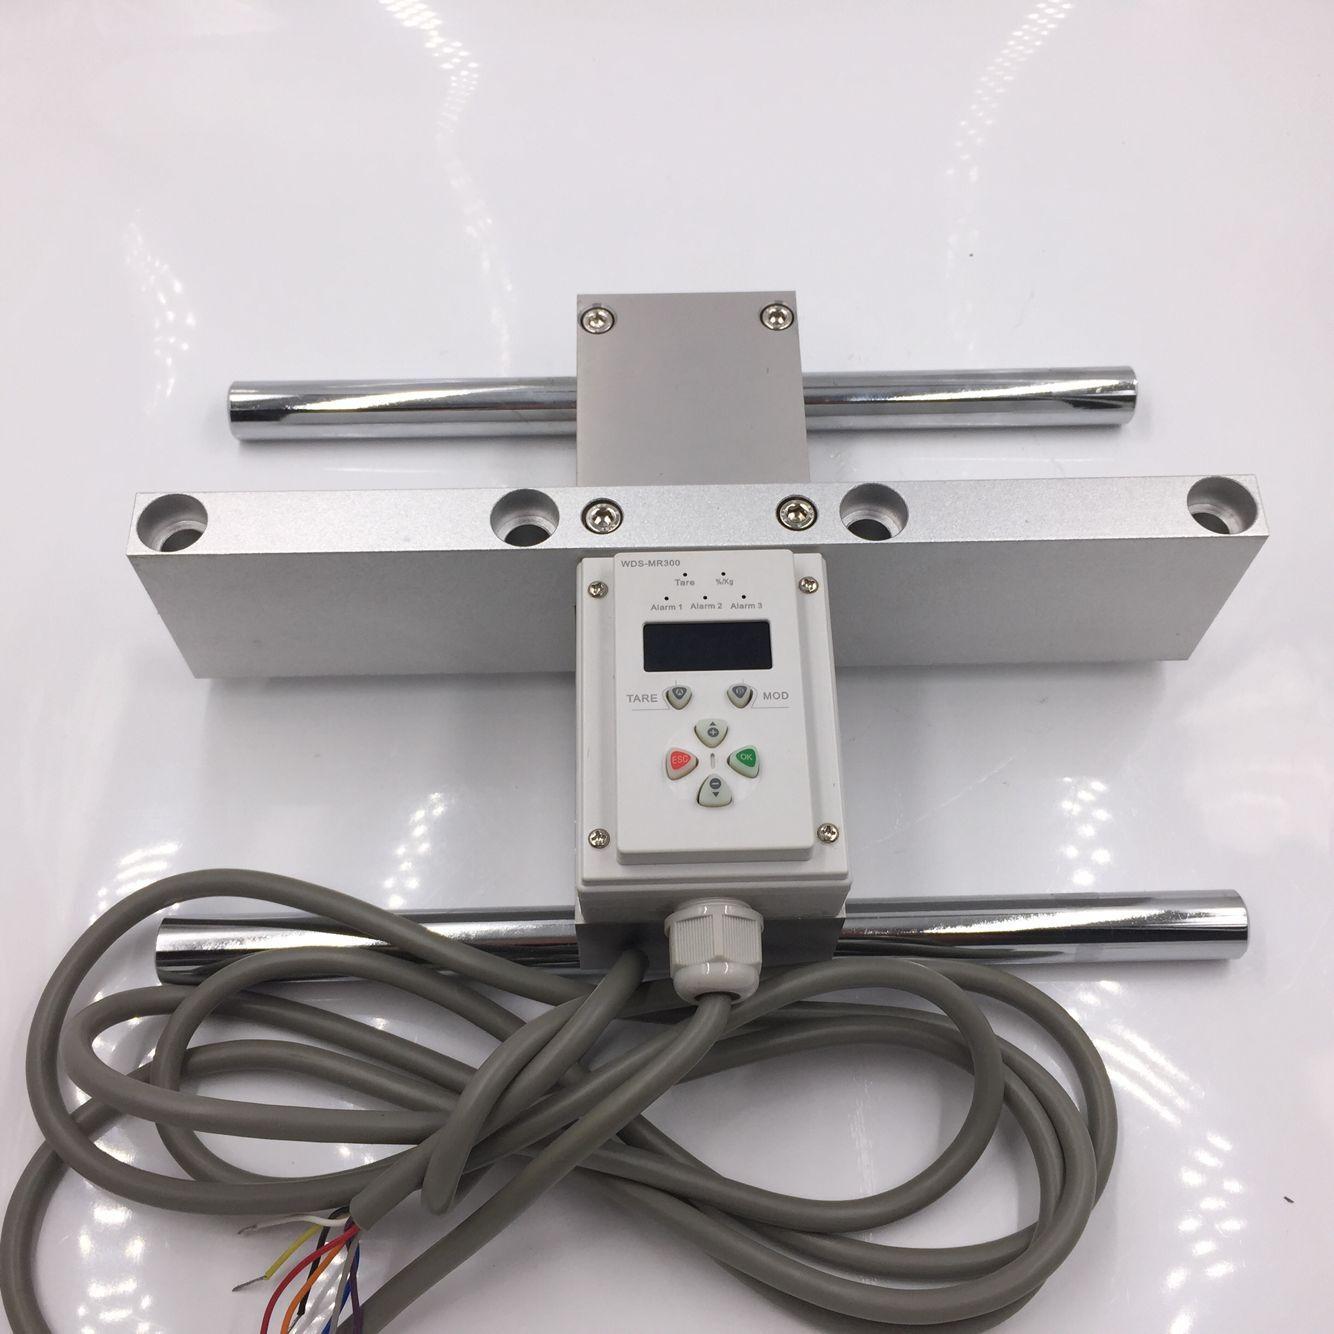 2 Relay Load Limiter Controller Sensor DC 24V for Elevator Wire Rope ...